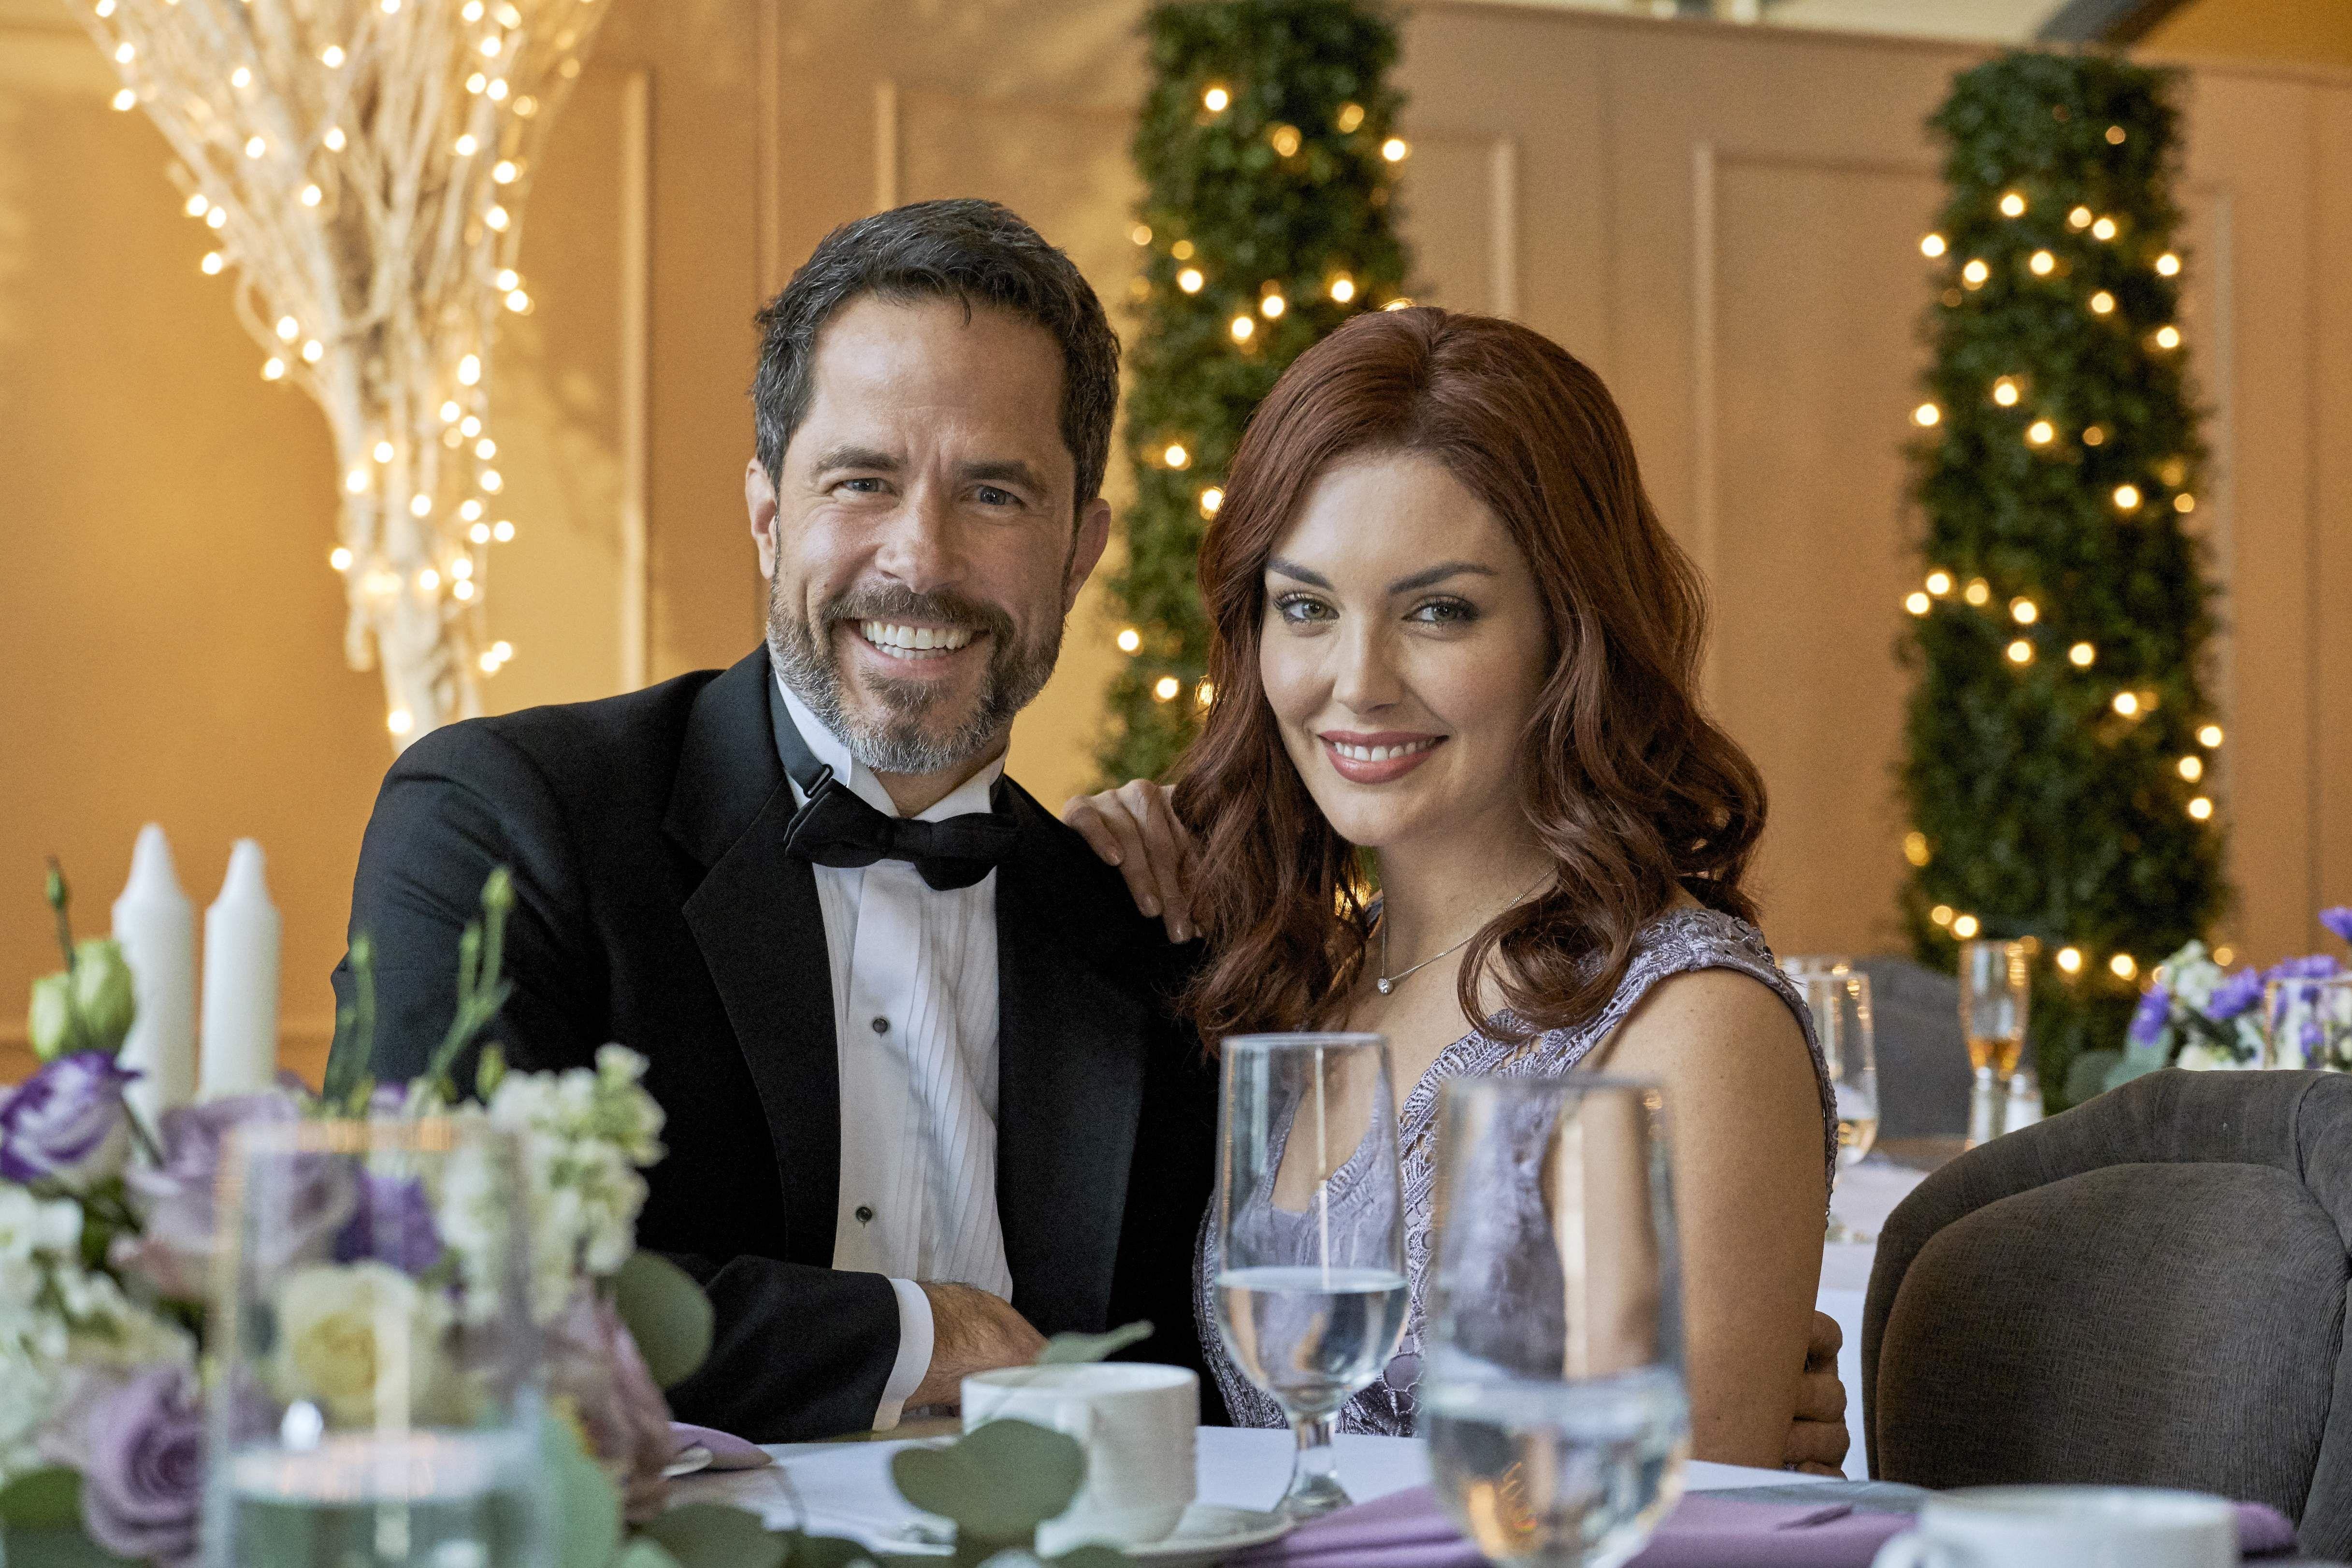 Hallmarks Ruby Herring Mysteries Silent Witness Cast Where Filmed Details Hallmark Movies Family Christmas Movies Christmas Movies On Tv